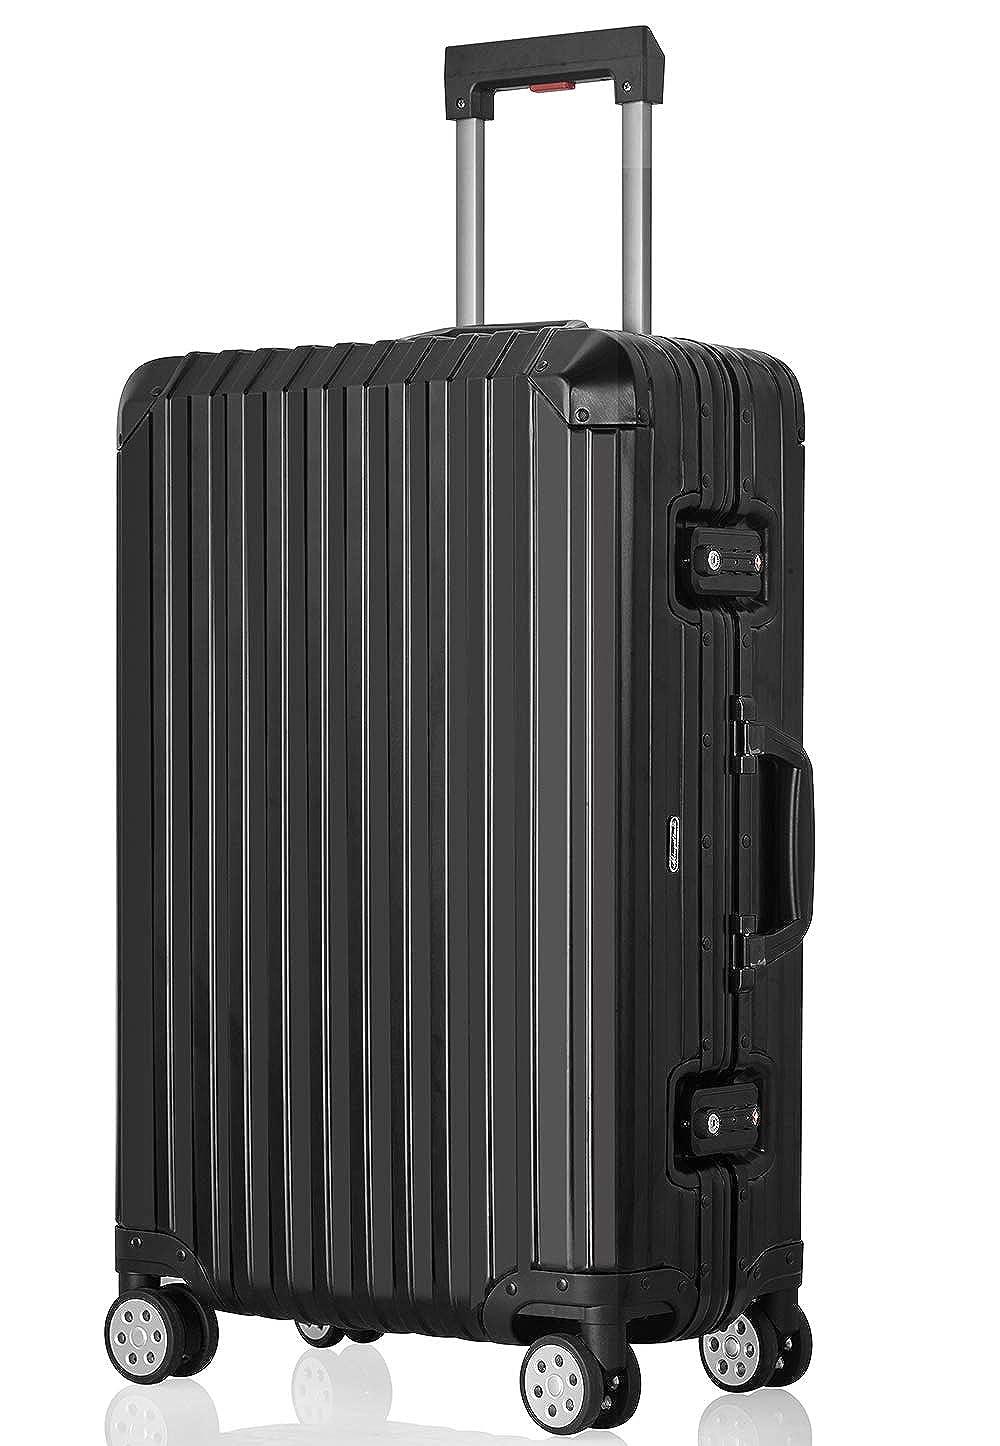 JINXIANGMEI アルミニウムマグネシウム合金スーツケース 機内持ち込みスーツケース 預け入れスーツケースTSAロック キャスター 海外旅行SA2020 B07K41Y8FG ブラック L